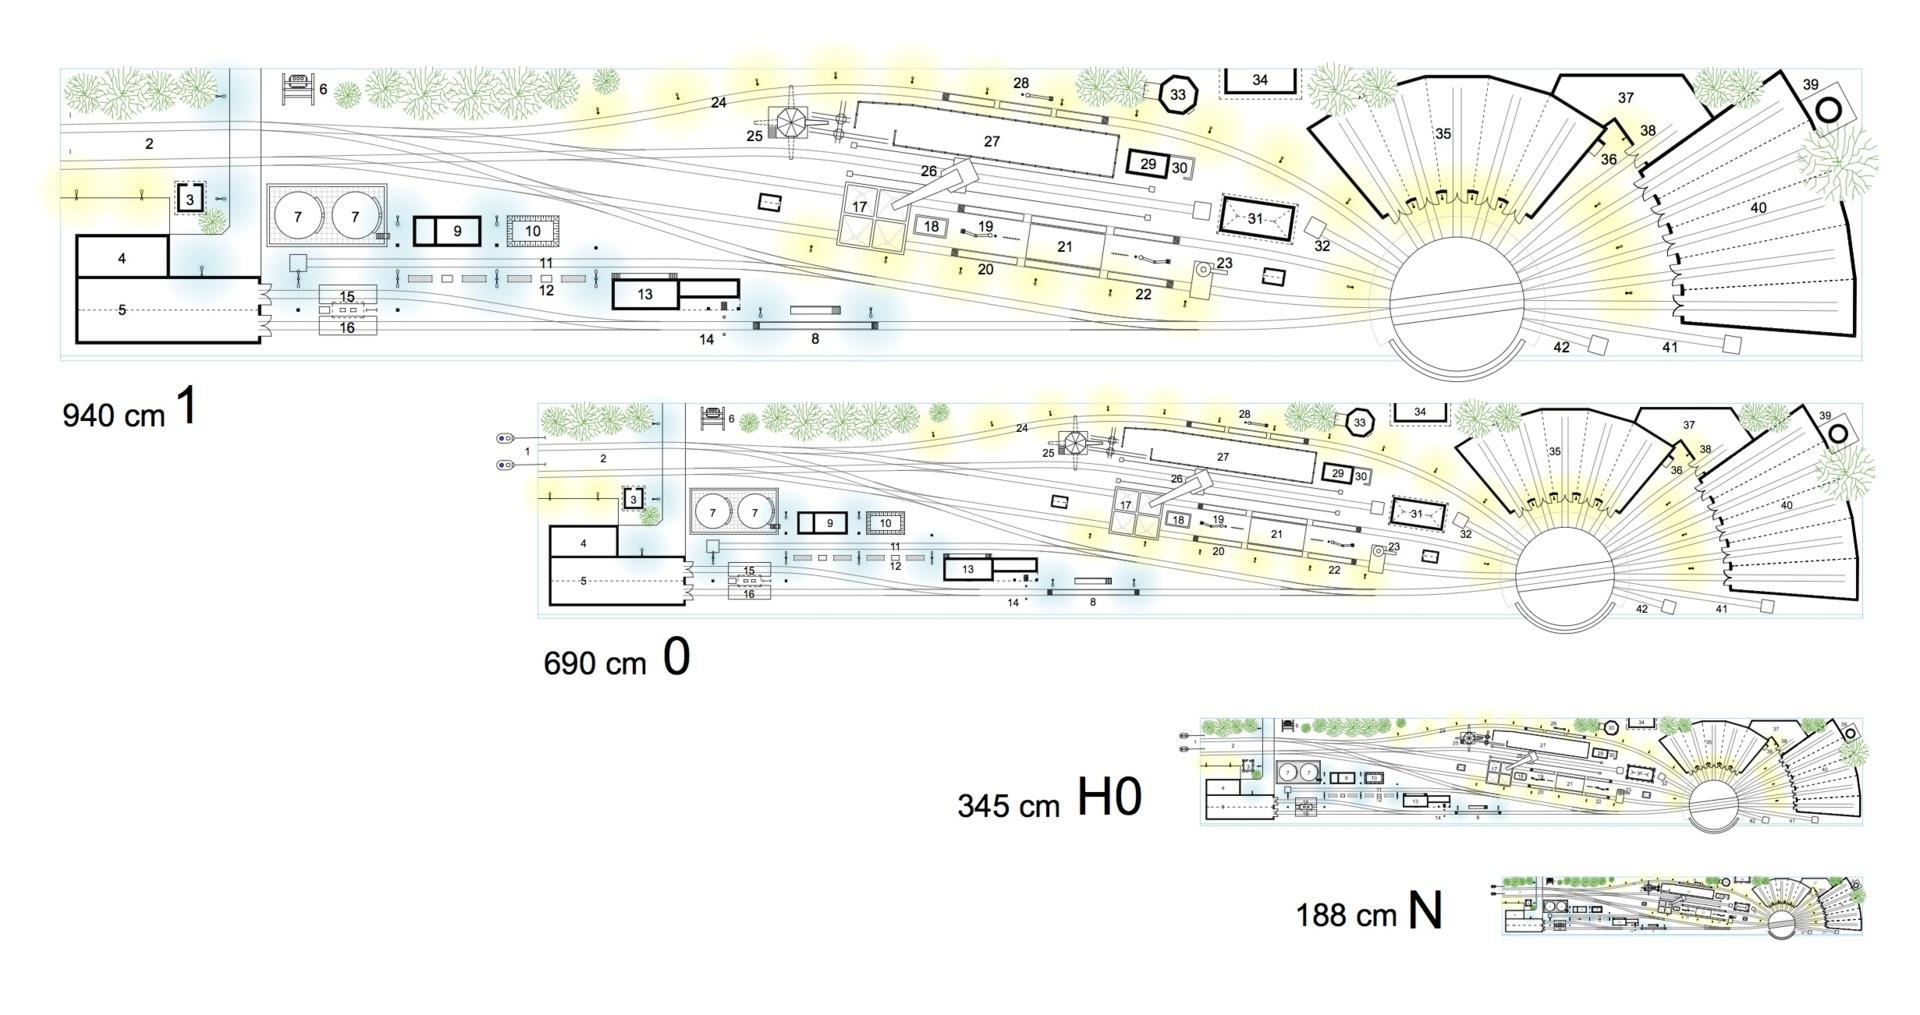 Lokomotywownia 1,0,H0,N.jpg